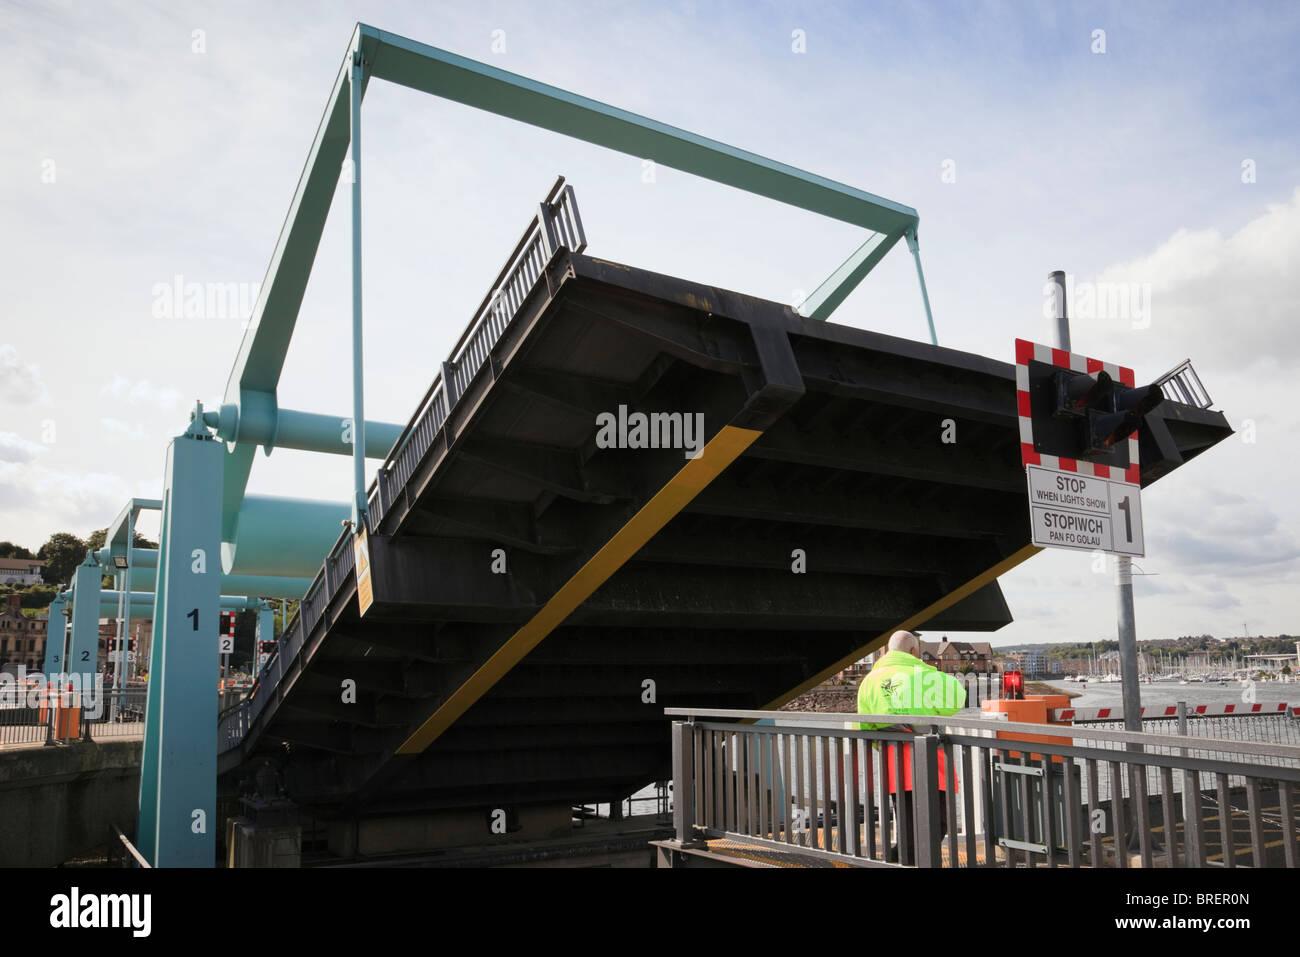 Cardiff Bay (Bae Caerdydd), Glamorgan, South Wales, UK. Operator lifting bascule bridge on the Cardiff Barrage - Stock Image